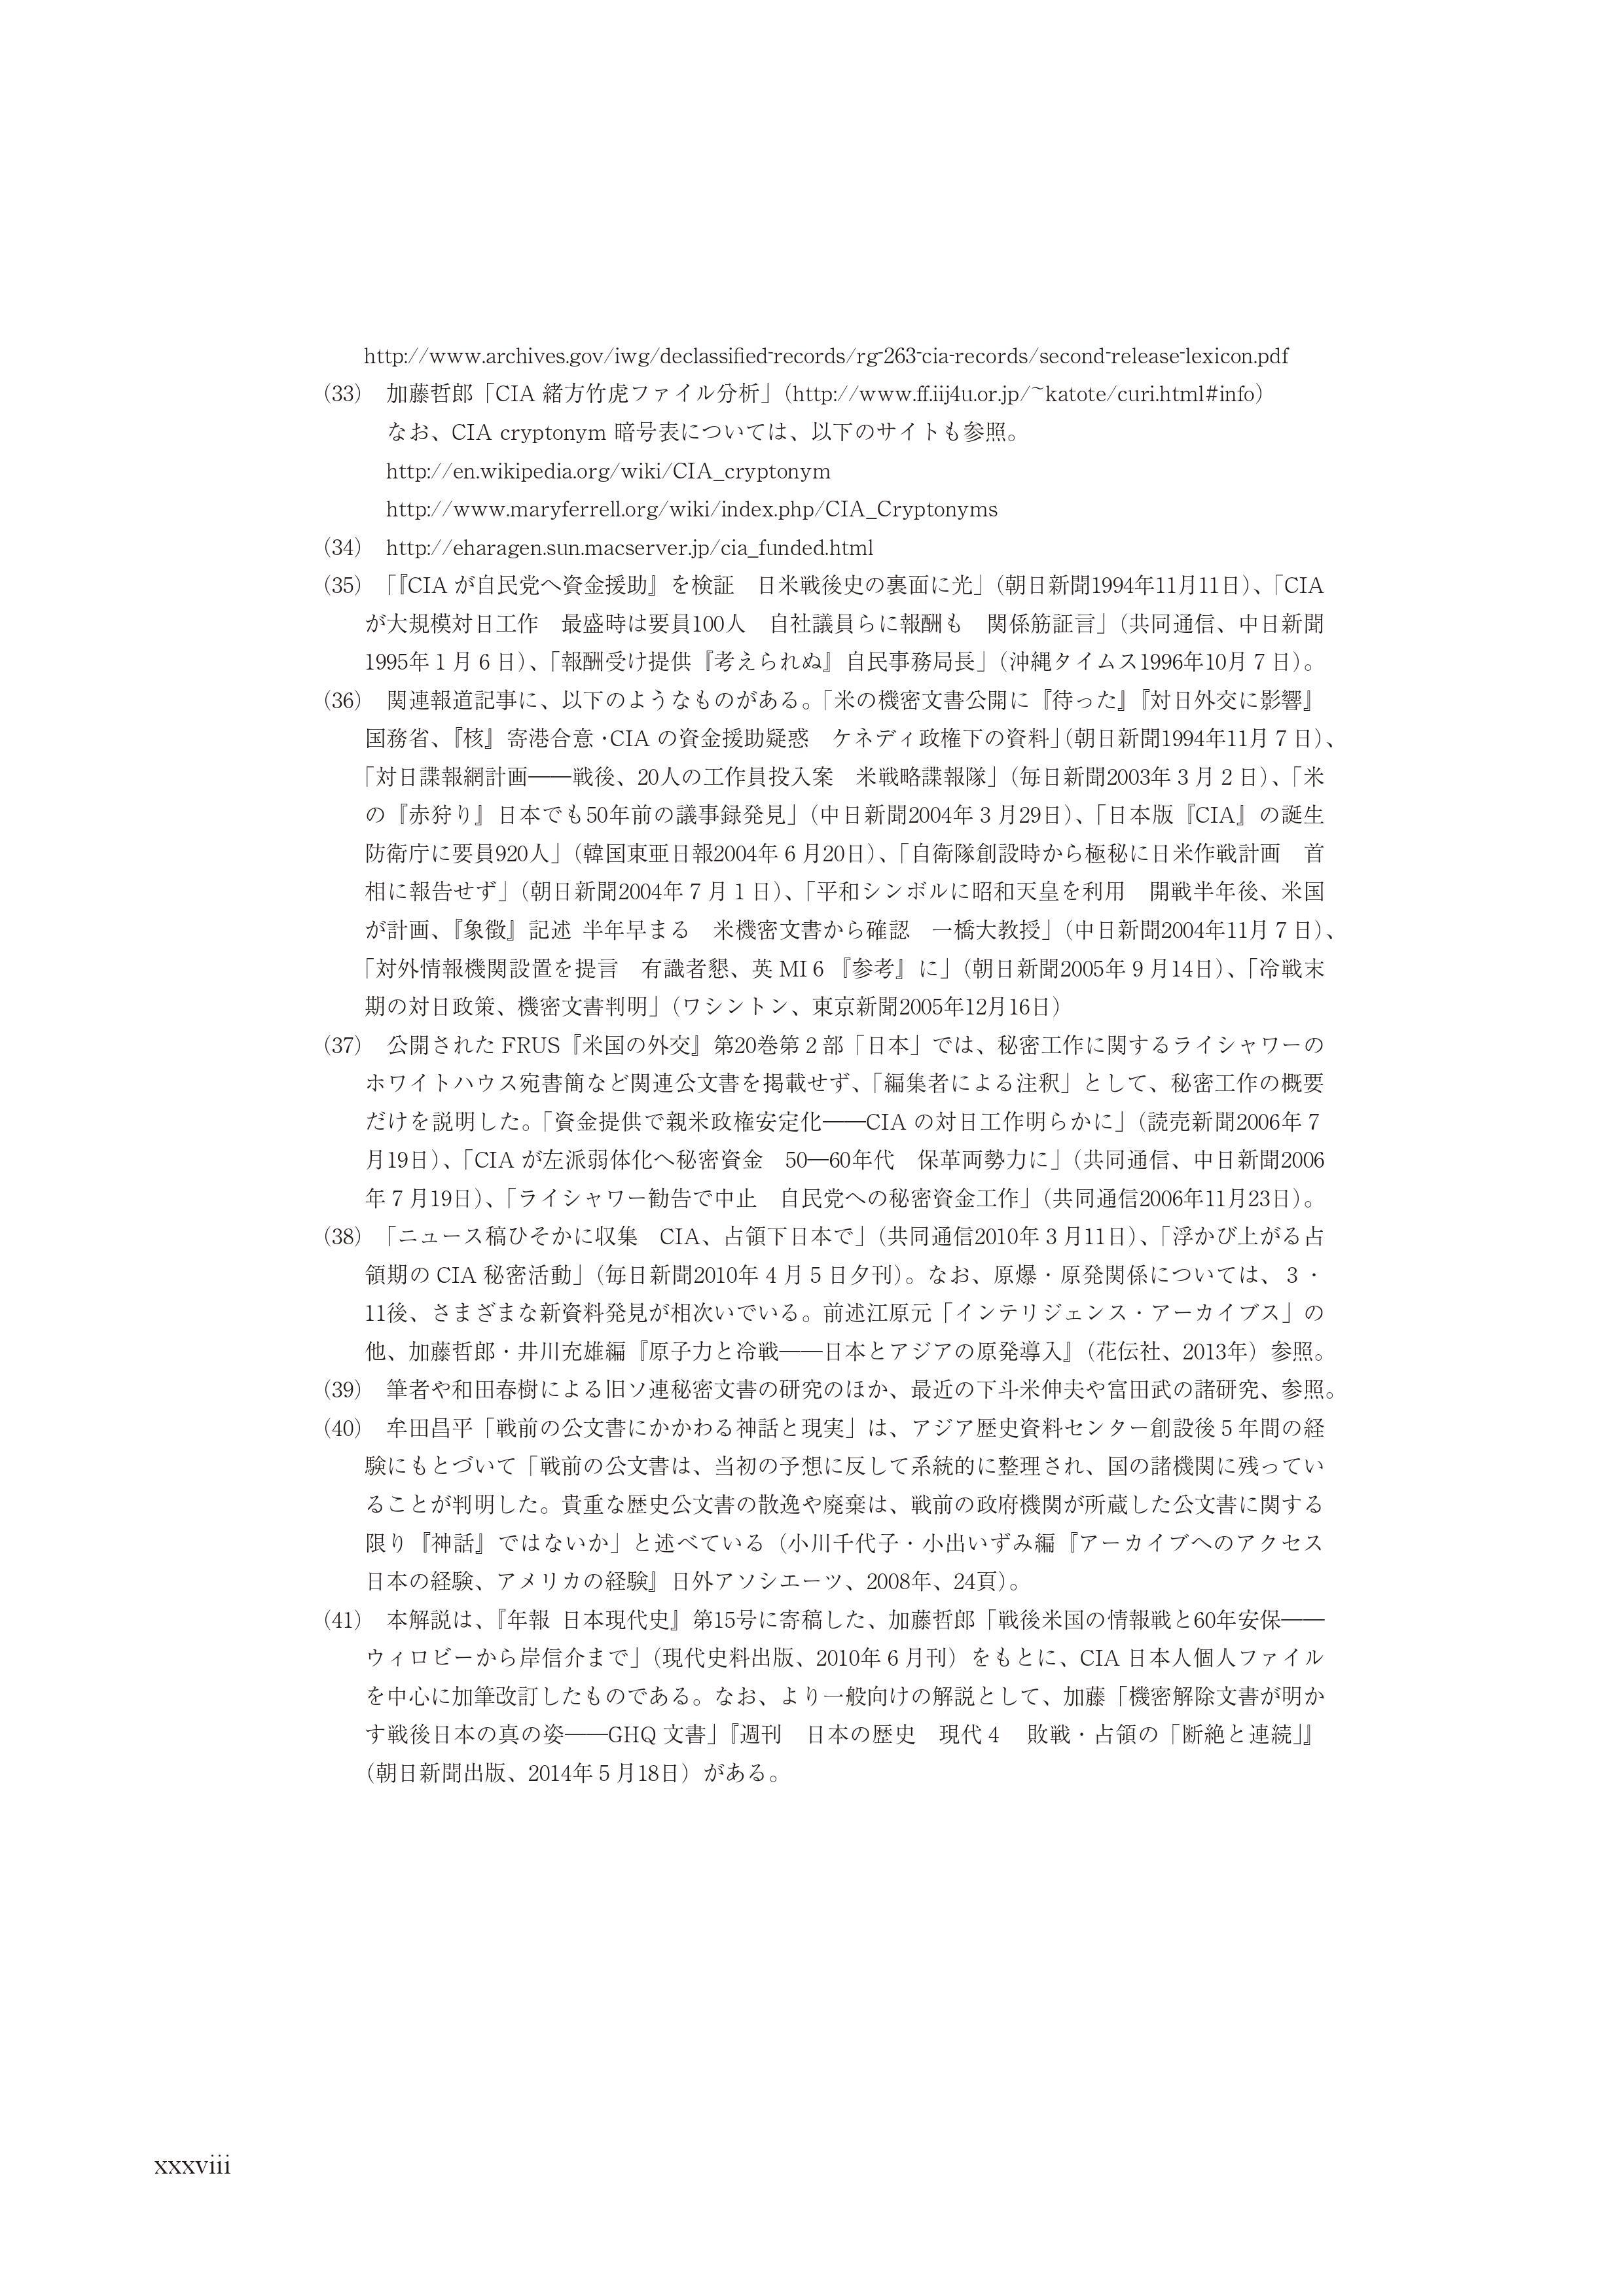 CIA日本人ファイル0001 (38)